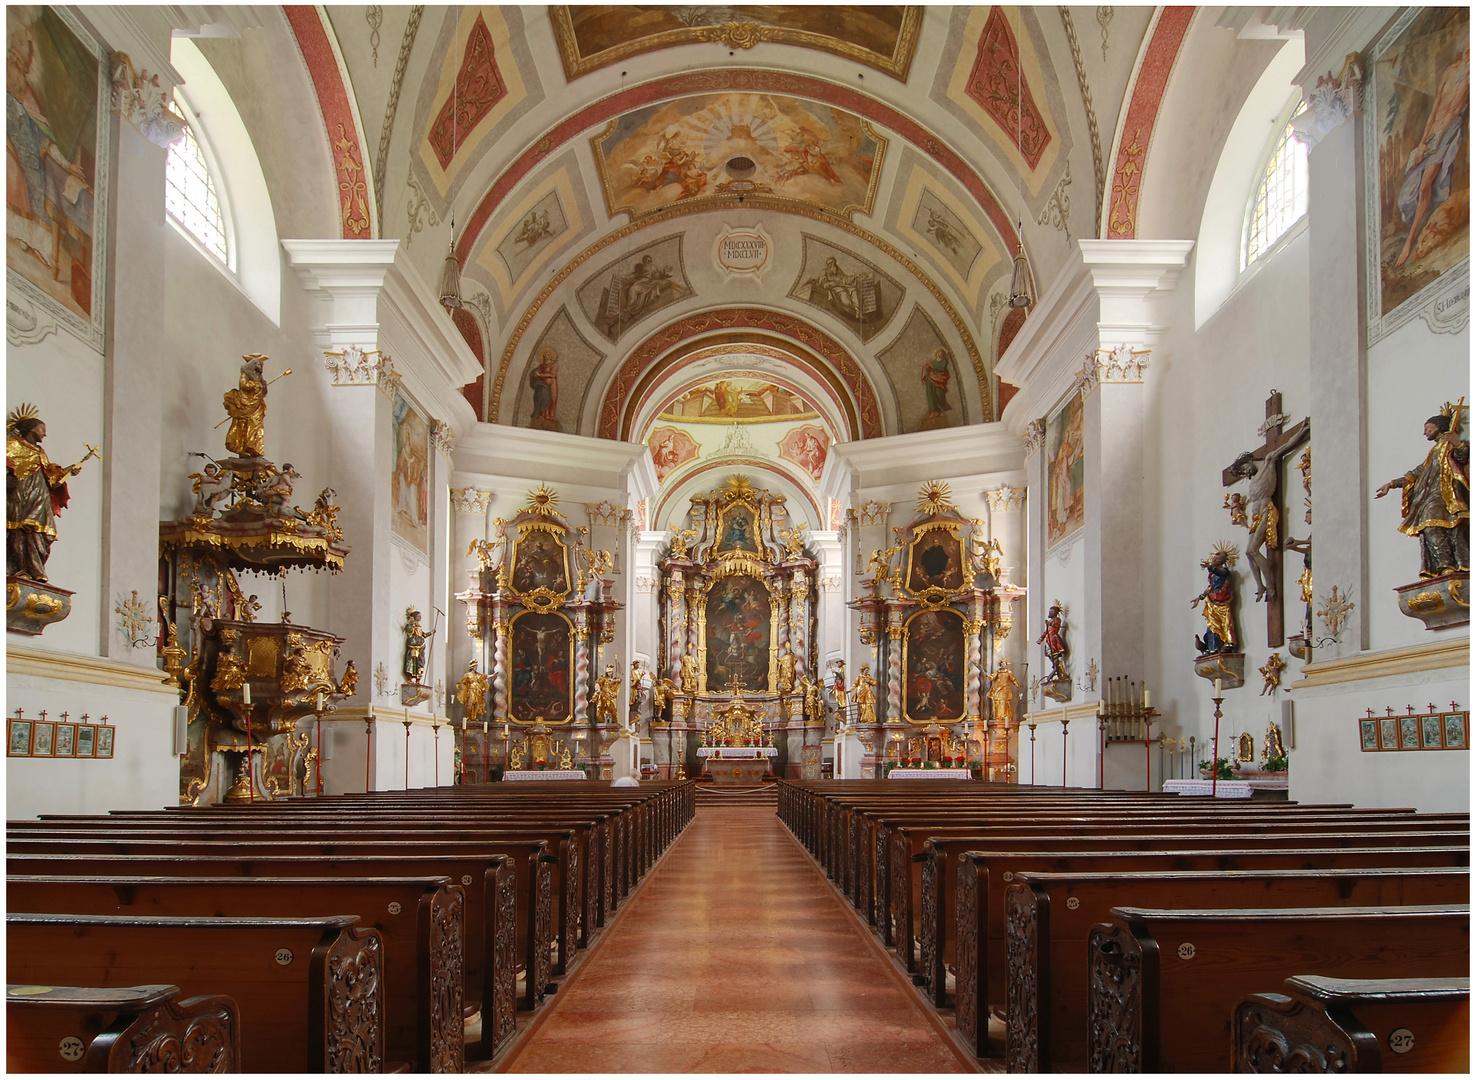 St. Georg - Pfarrkirche in Ruhpolding